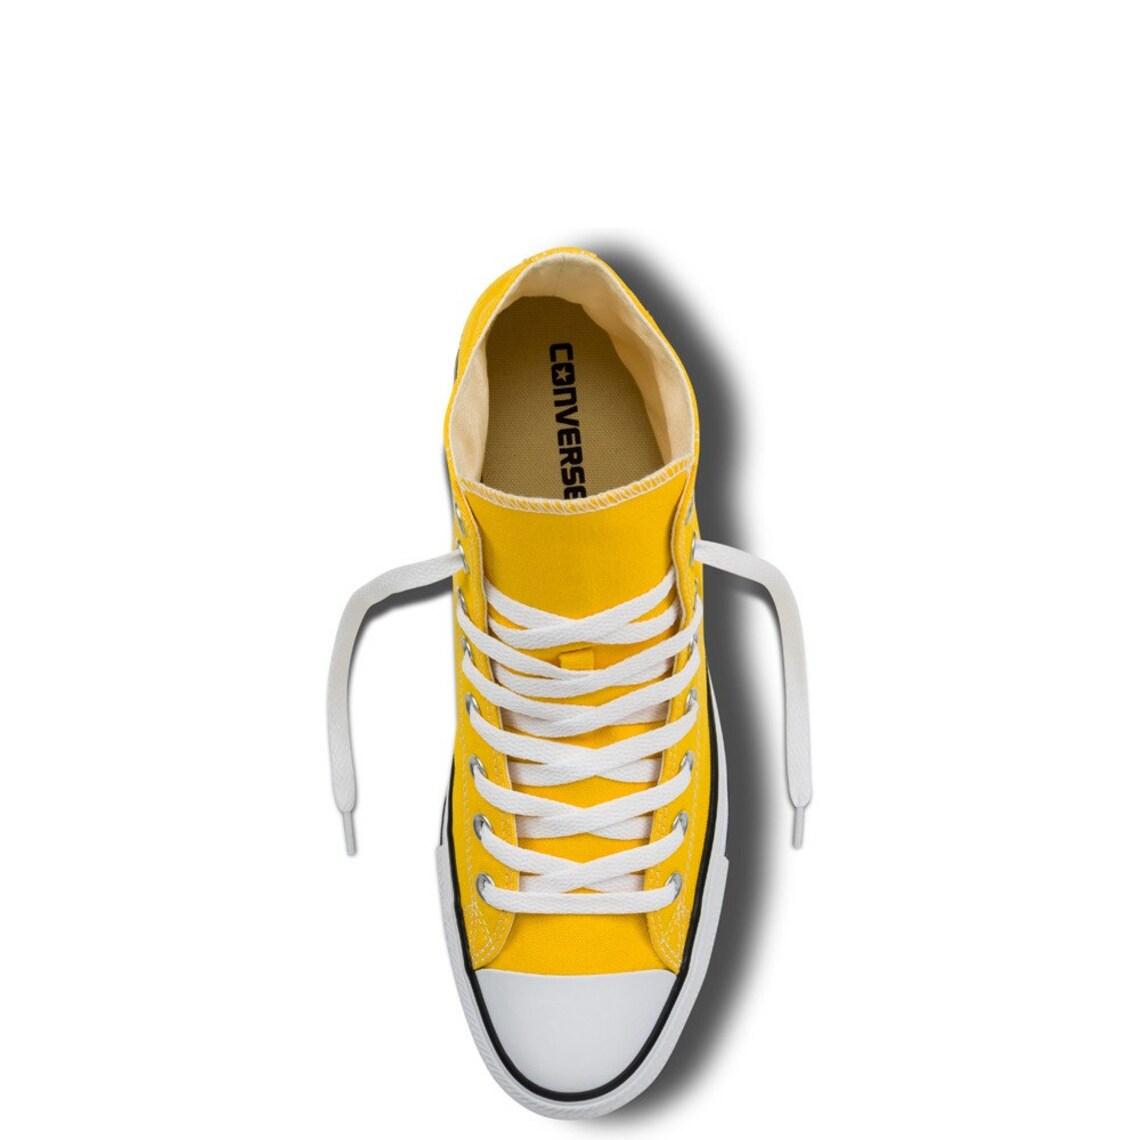 Amarillo Converse High Tops Girasol Lemon Sol Personalizado w / Swarovski Cristal Rhinestone Bling Chuck Taylor All Star Bridal Wedding Sneaker Zapato